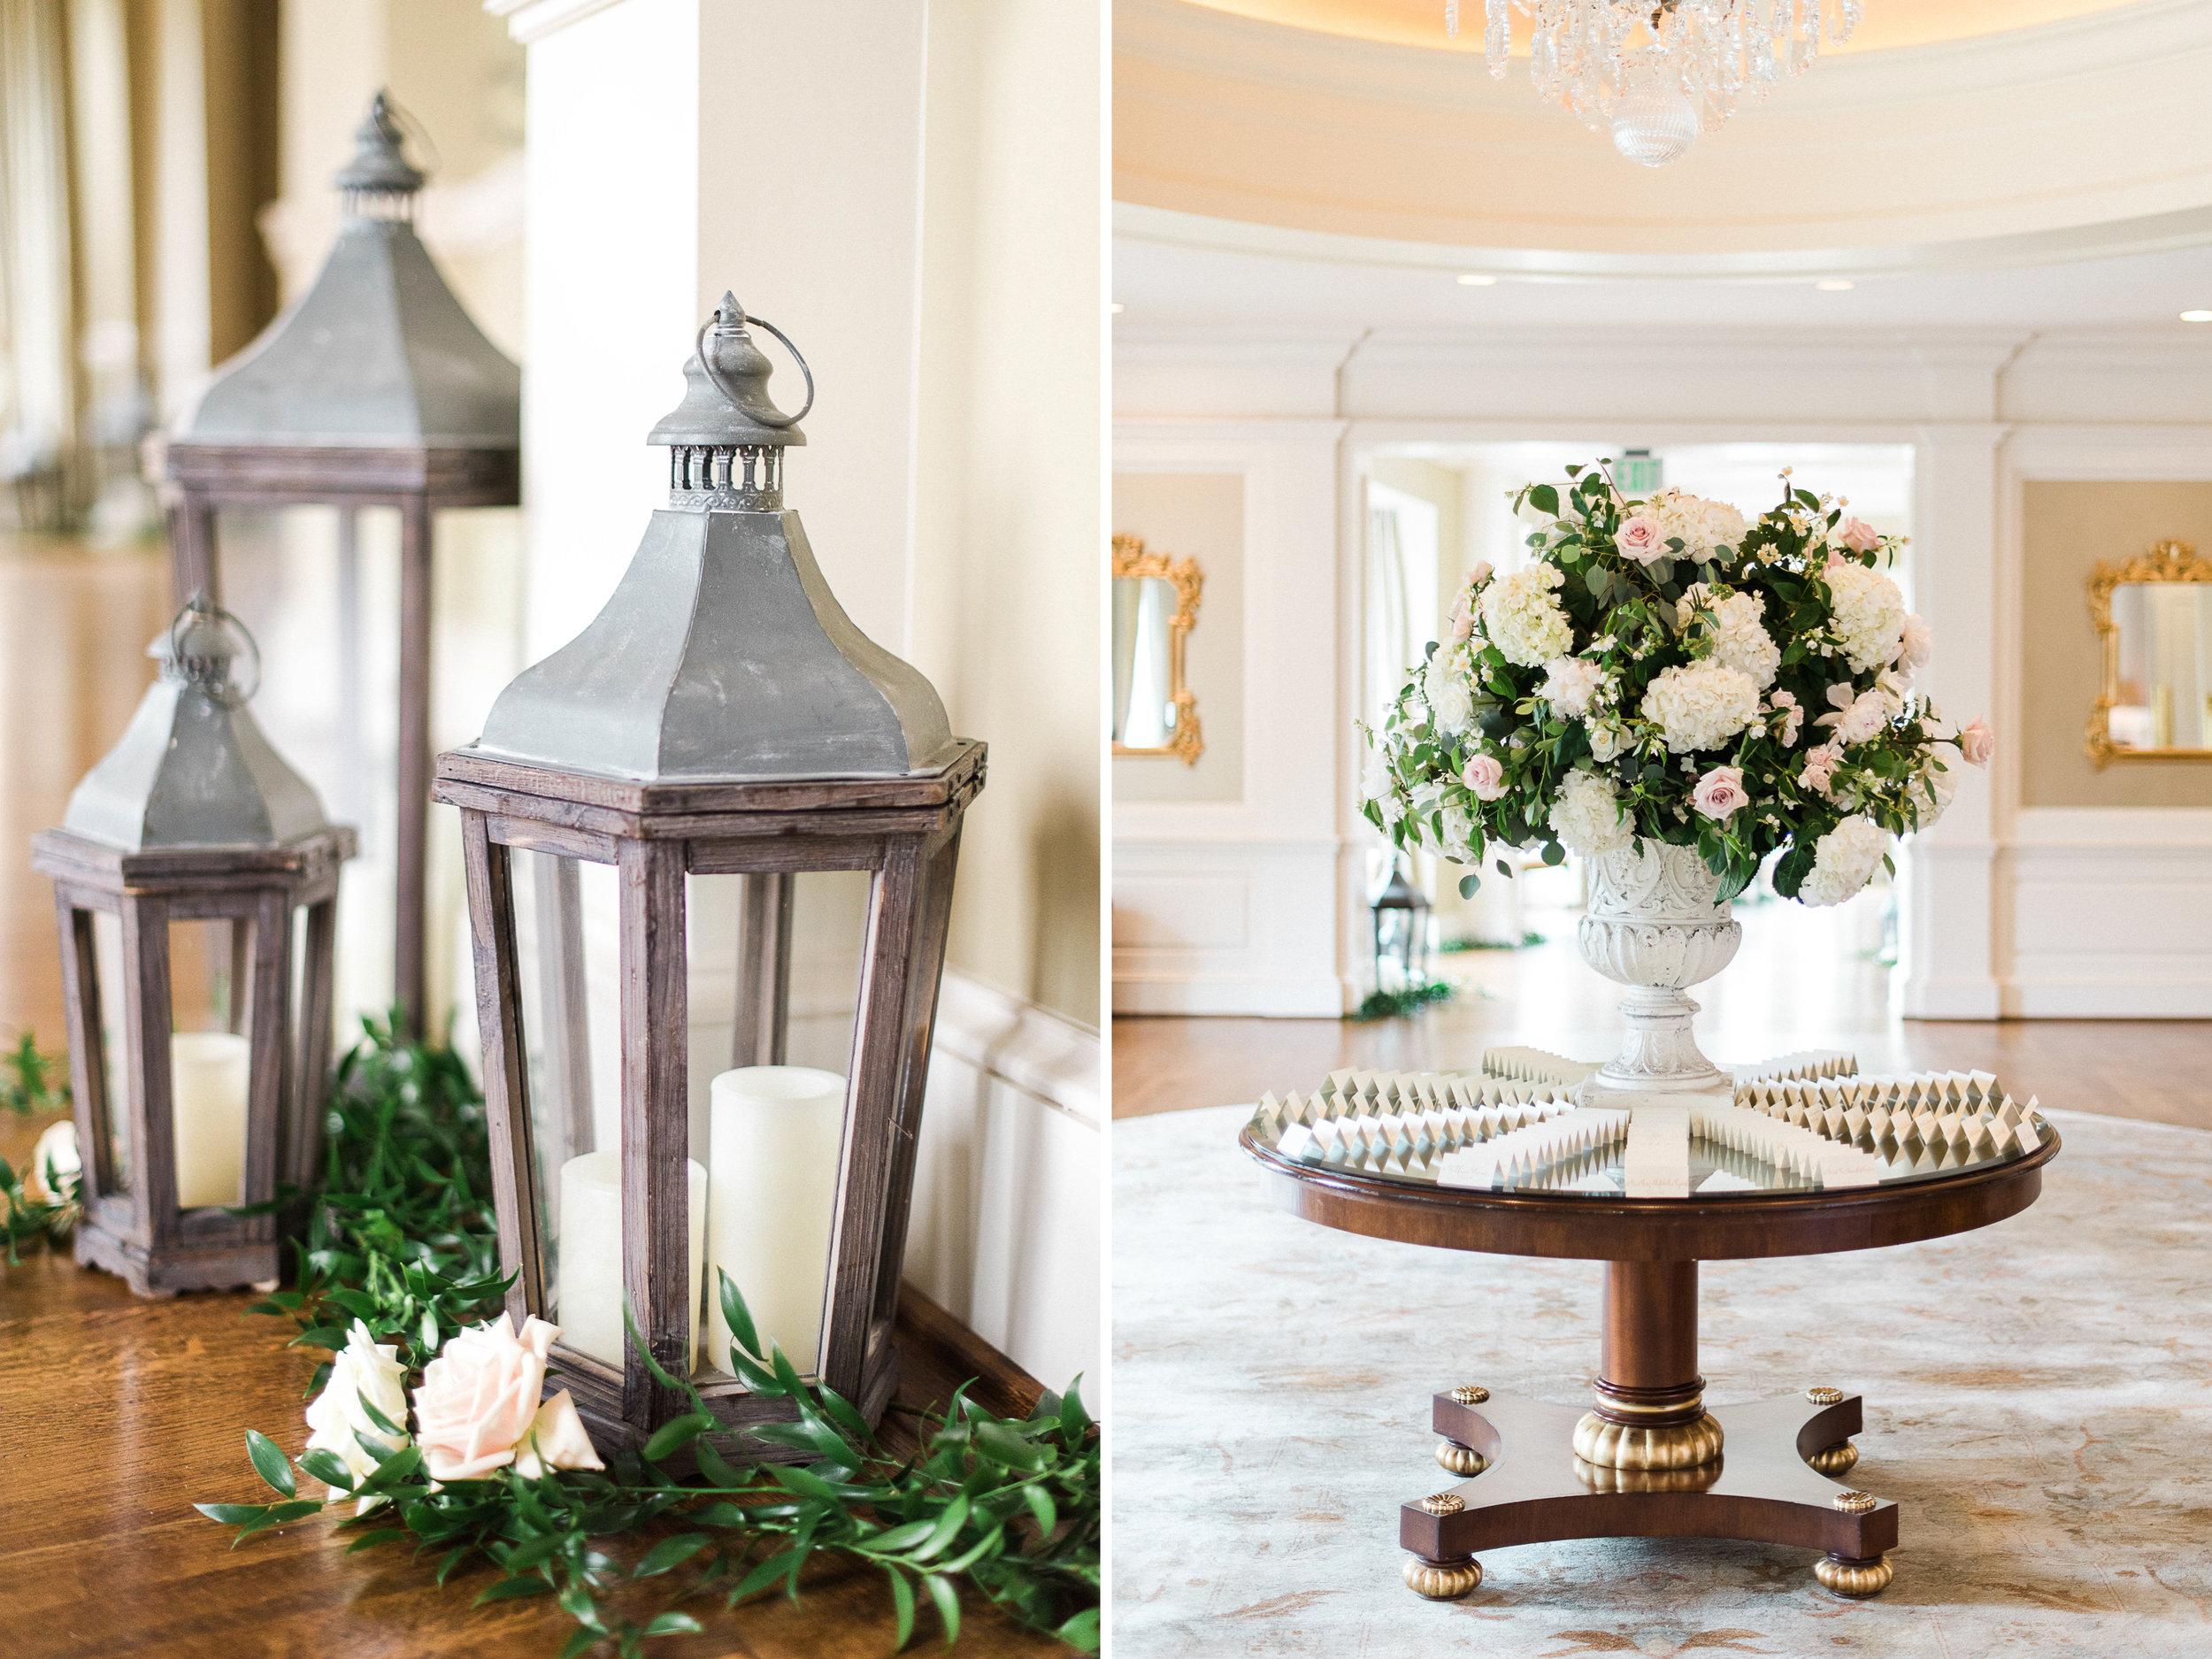 Fine-Art-Film-Houston-Wedding-Photographer-Best-Top-Luxury-Texas-Austin-Dallas-Destination-Dana-Fernandez-Photography-River-Oaks-Country-Club-South-Main-Baptist-Ceremony-Reception-Wedding-107.jpg